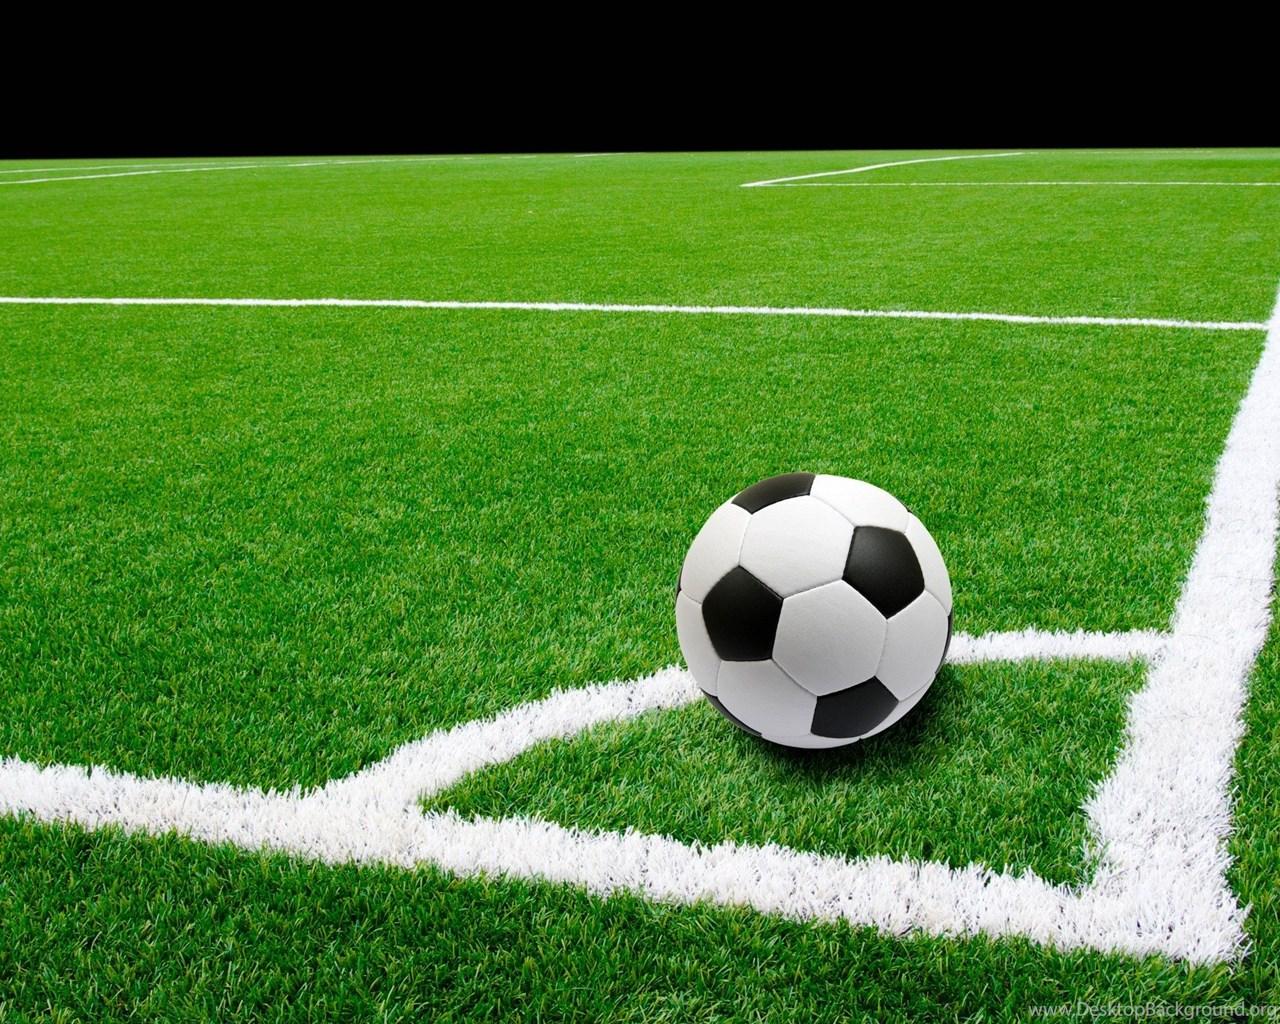 Free Download Wallpaper Football: Free Download Football Backgrounds Desktop Background